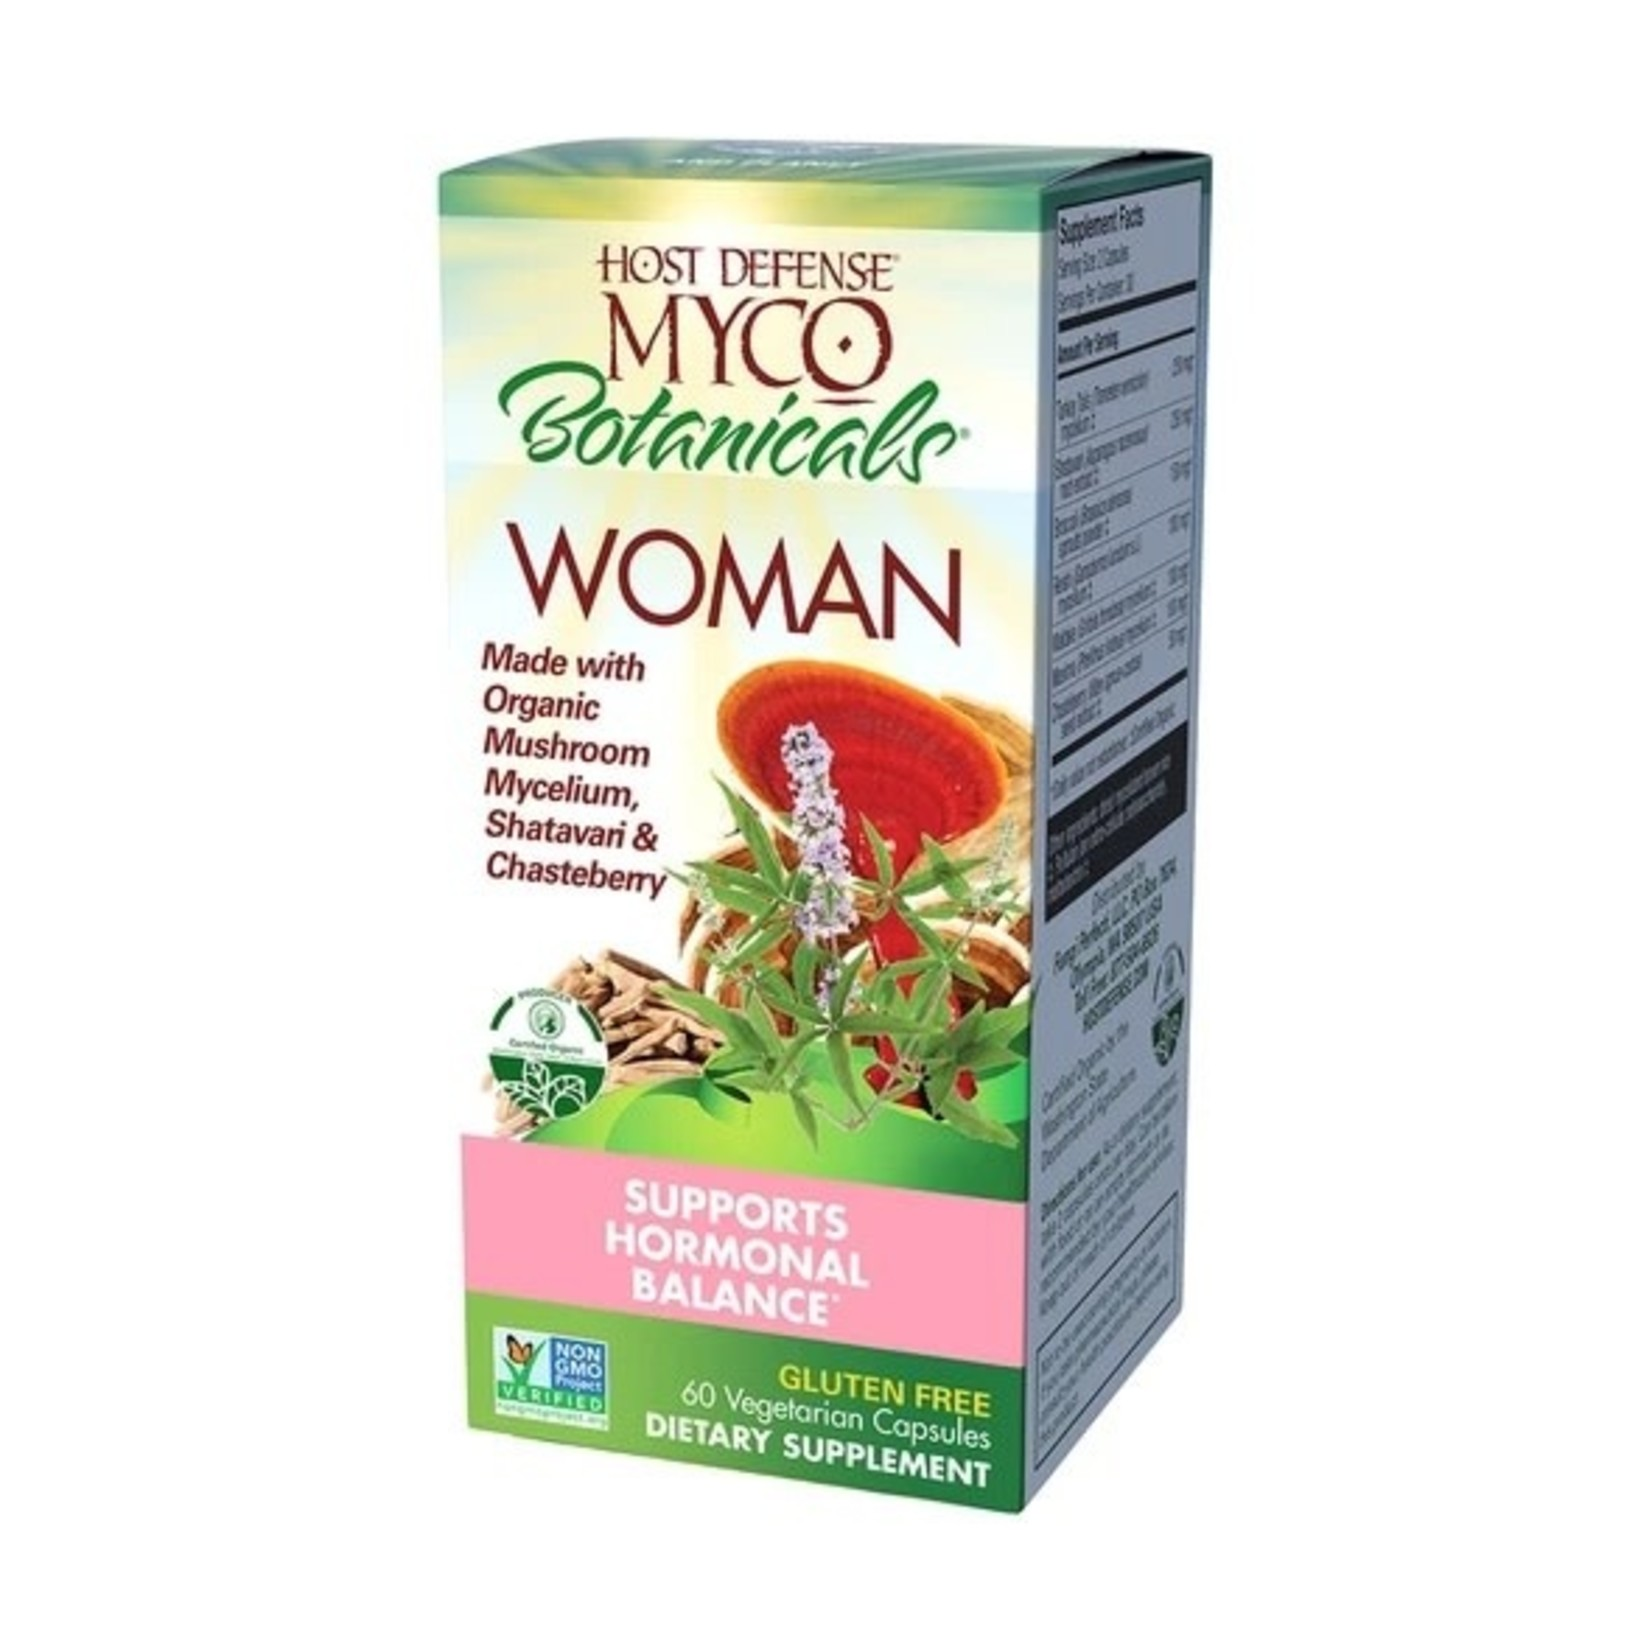 Host Defense HD Myco Botanicals WOMAN 60 capsules